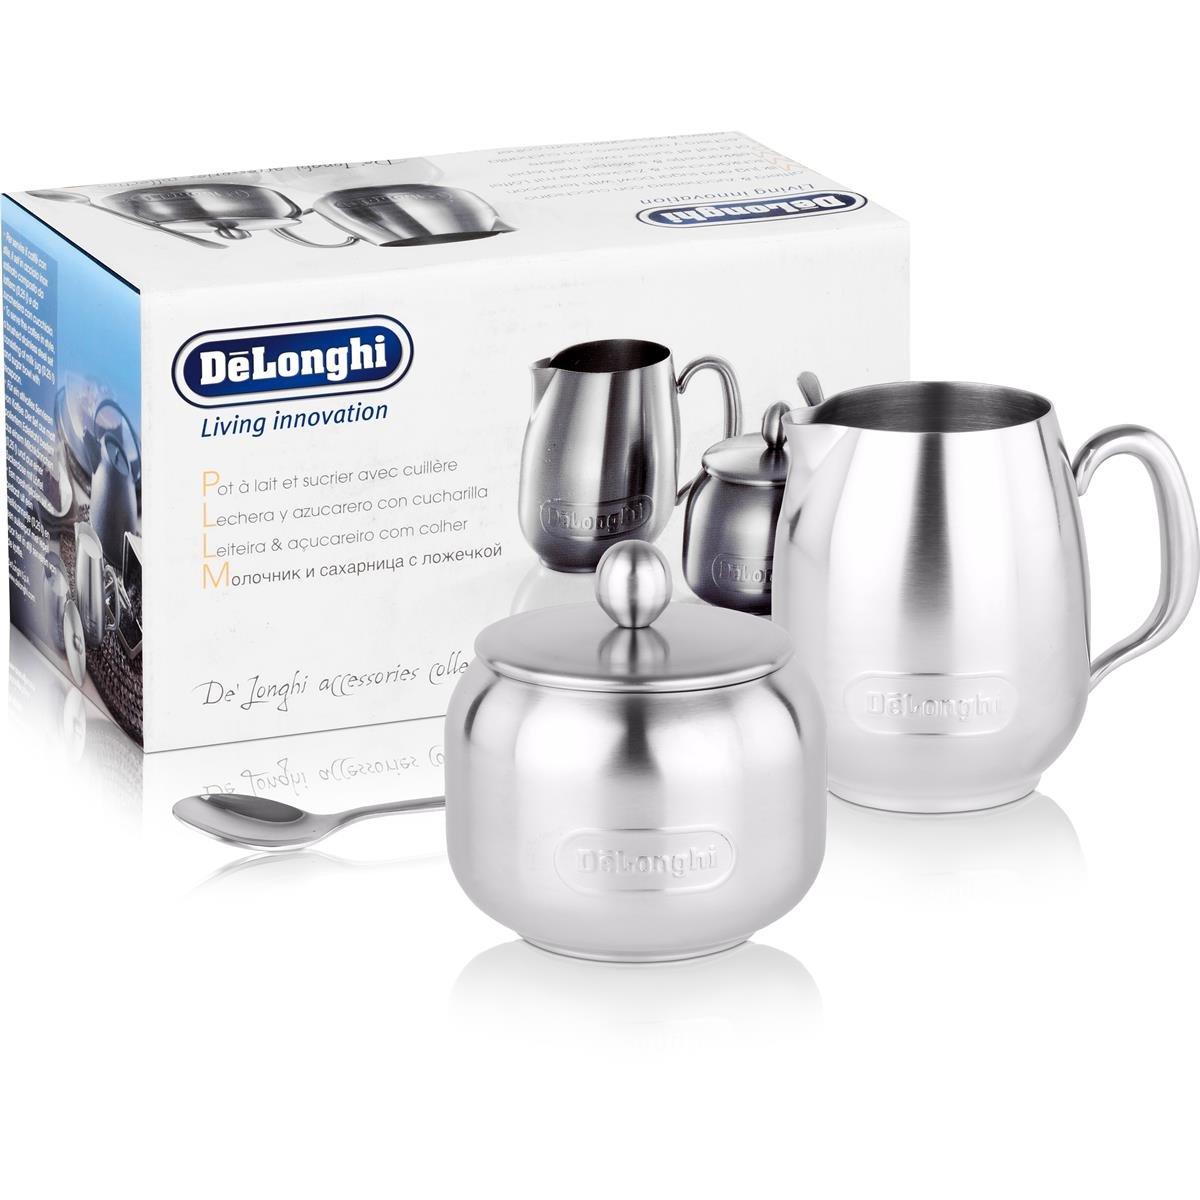 DeLonghi 5532125300 Milch /& Zuckersets